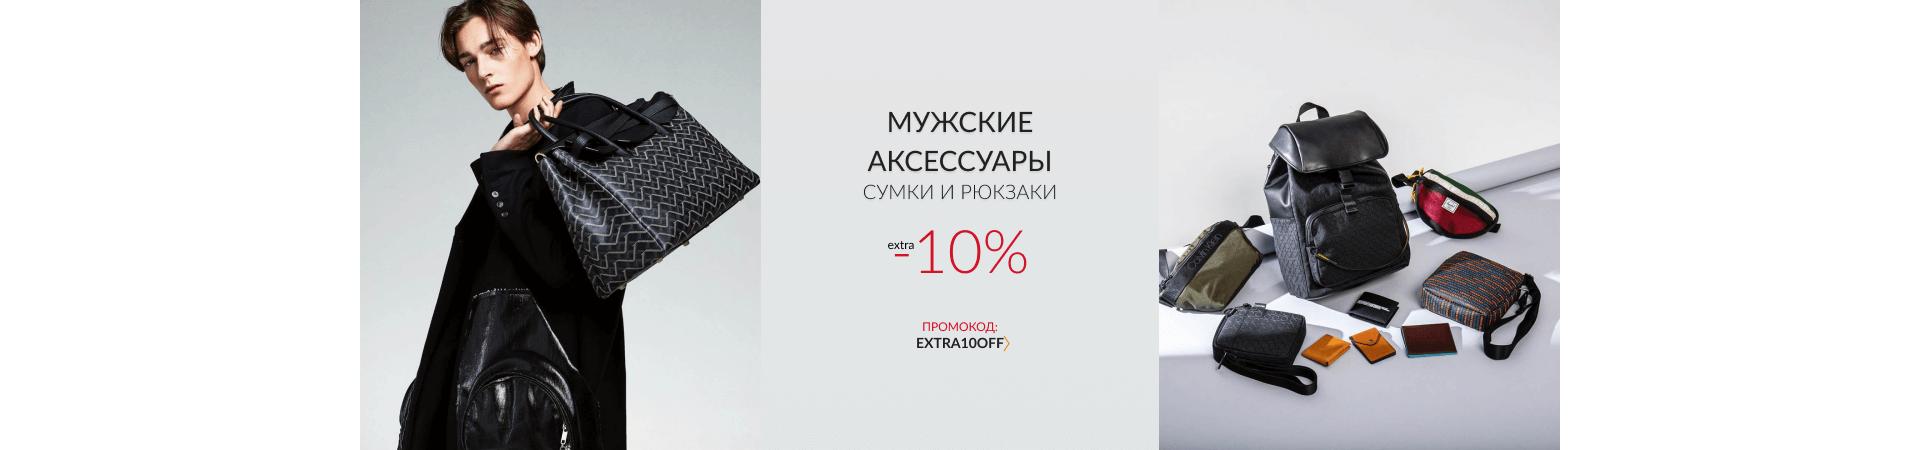 Аксы м -10%